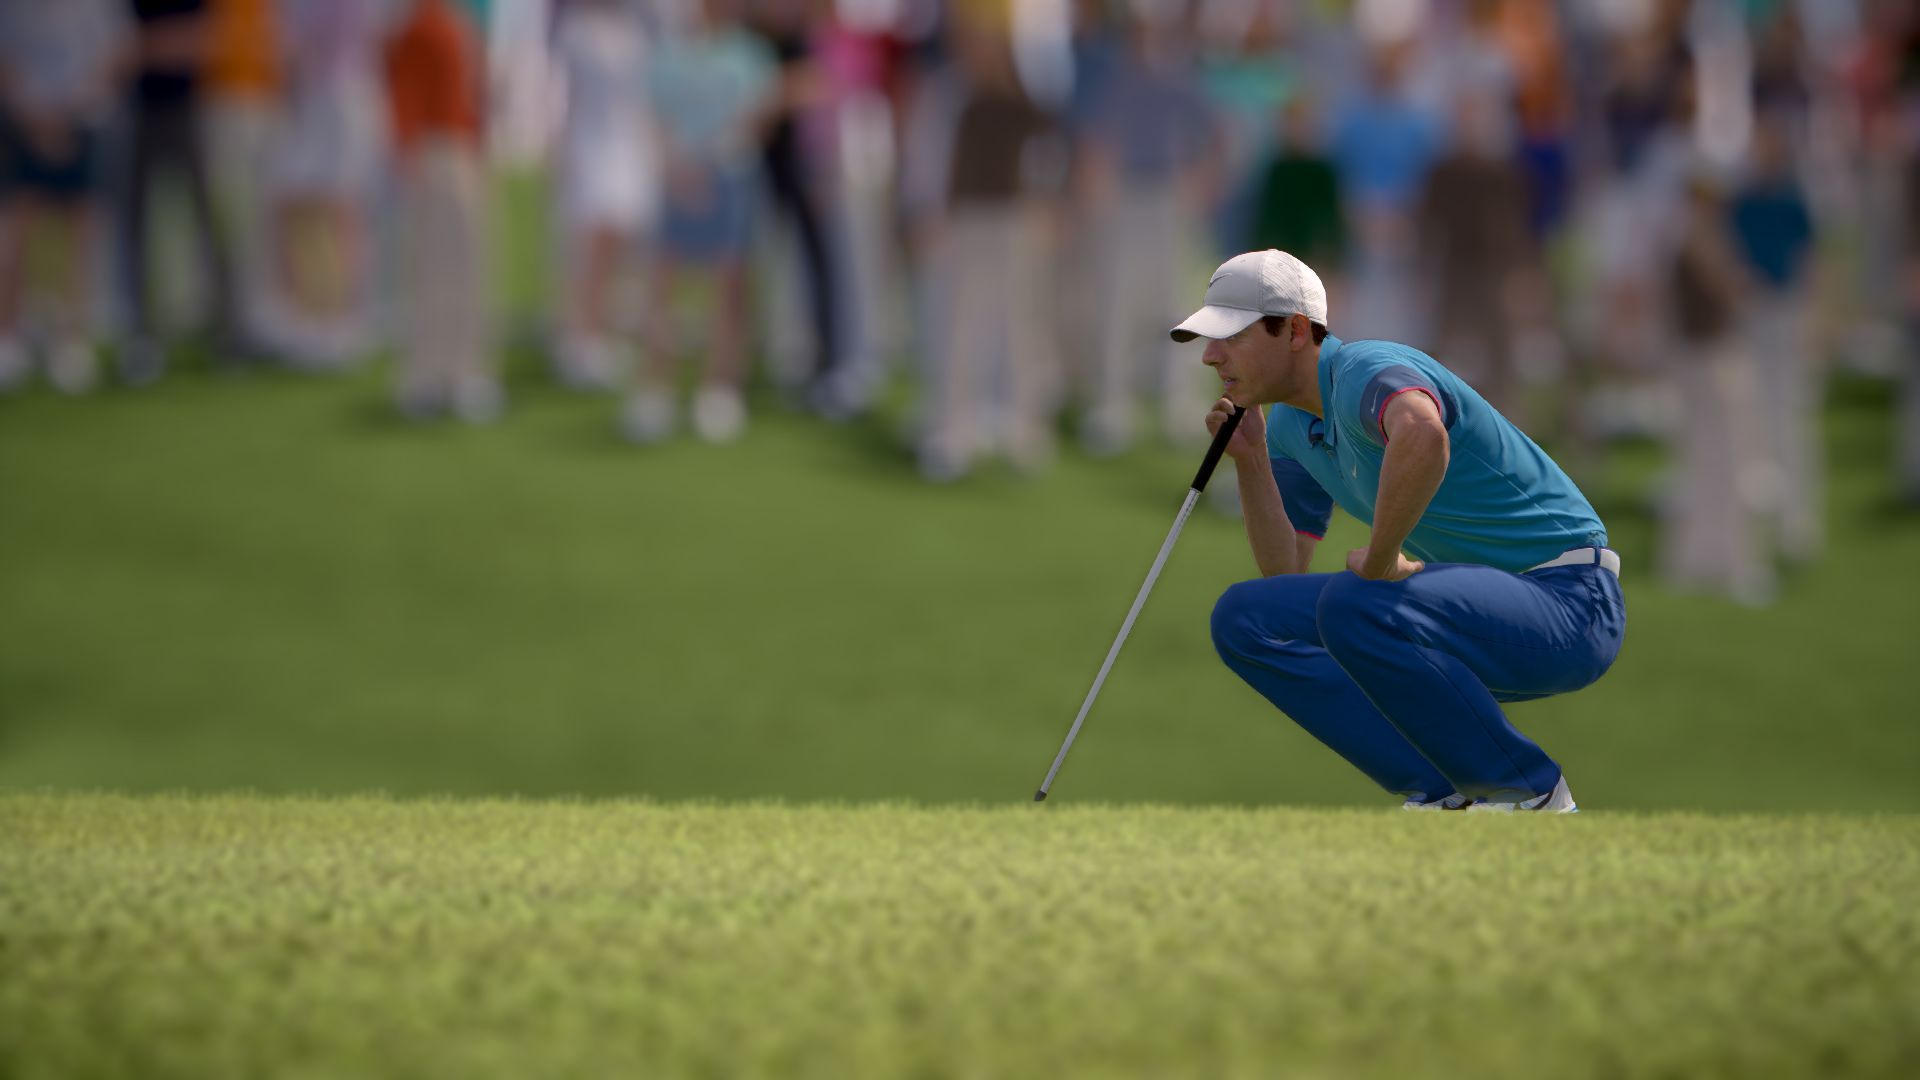 Rory-McIlroy-PGA-Tour-5